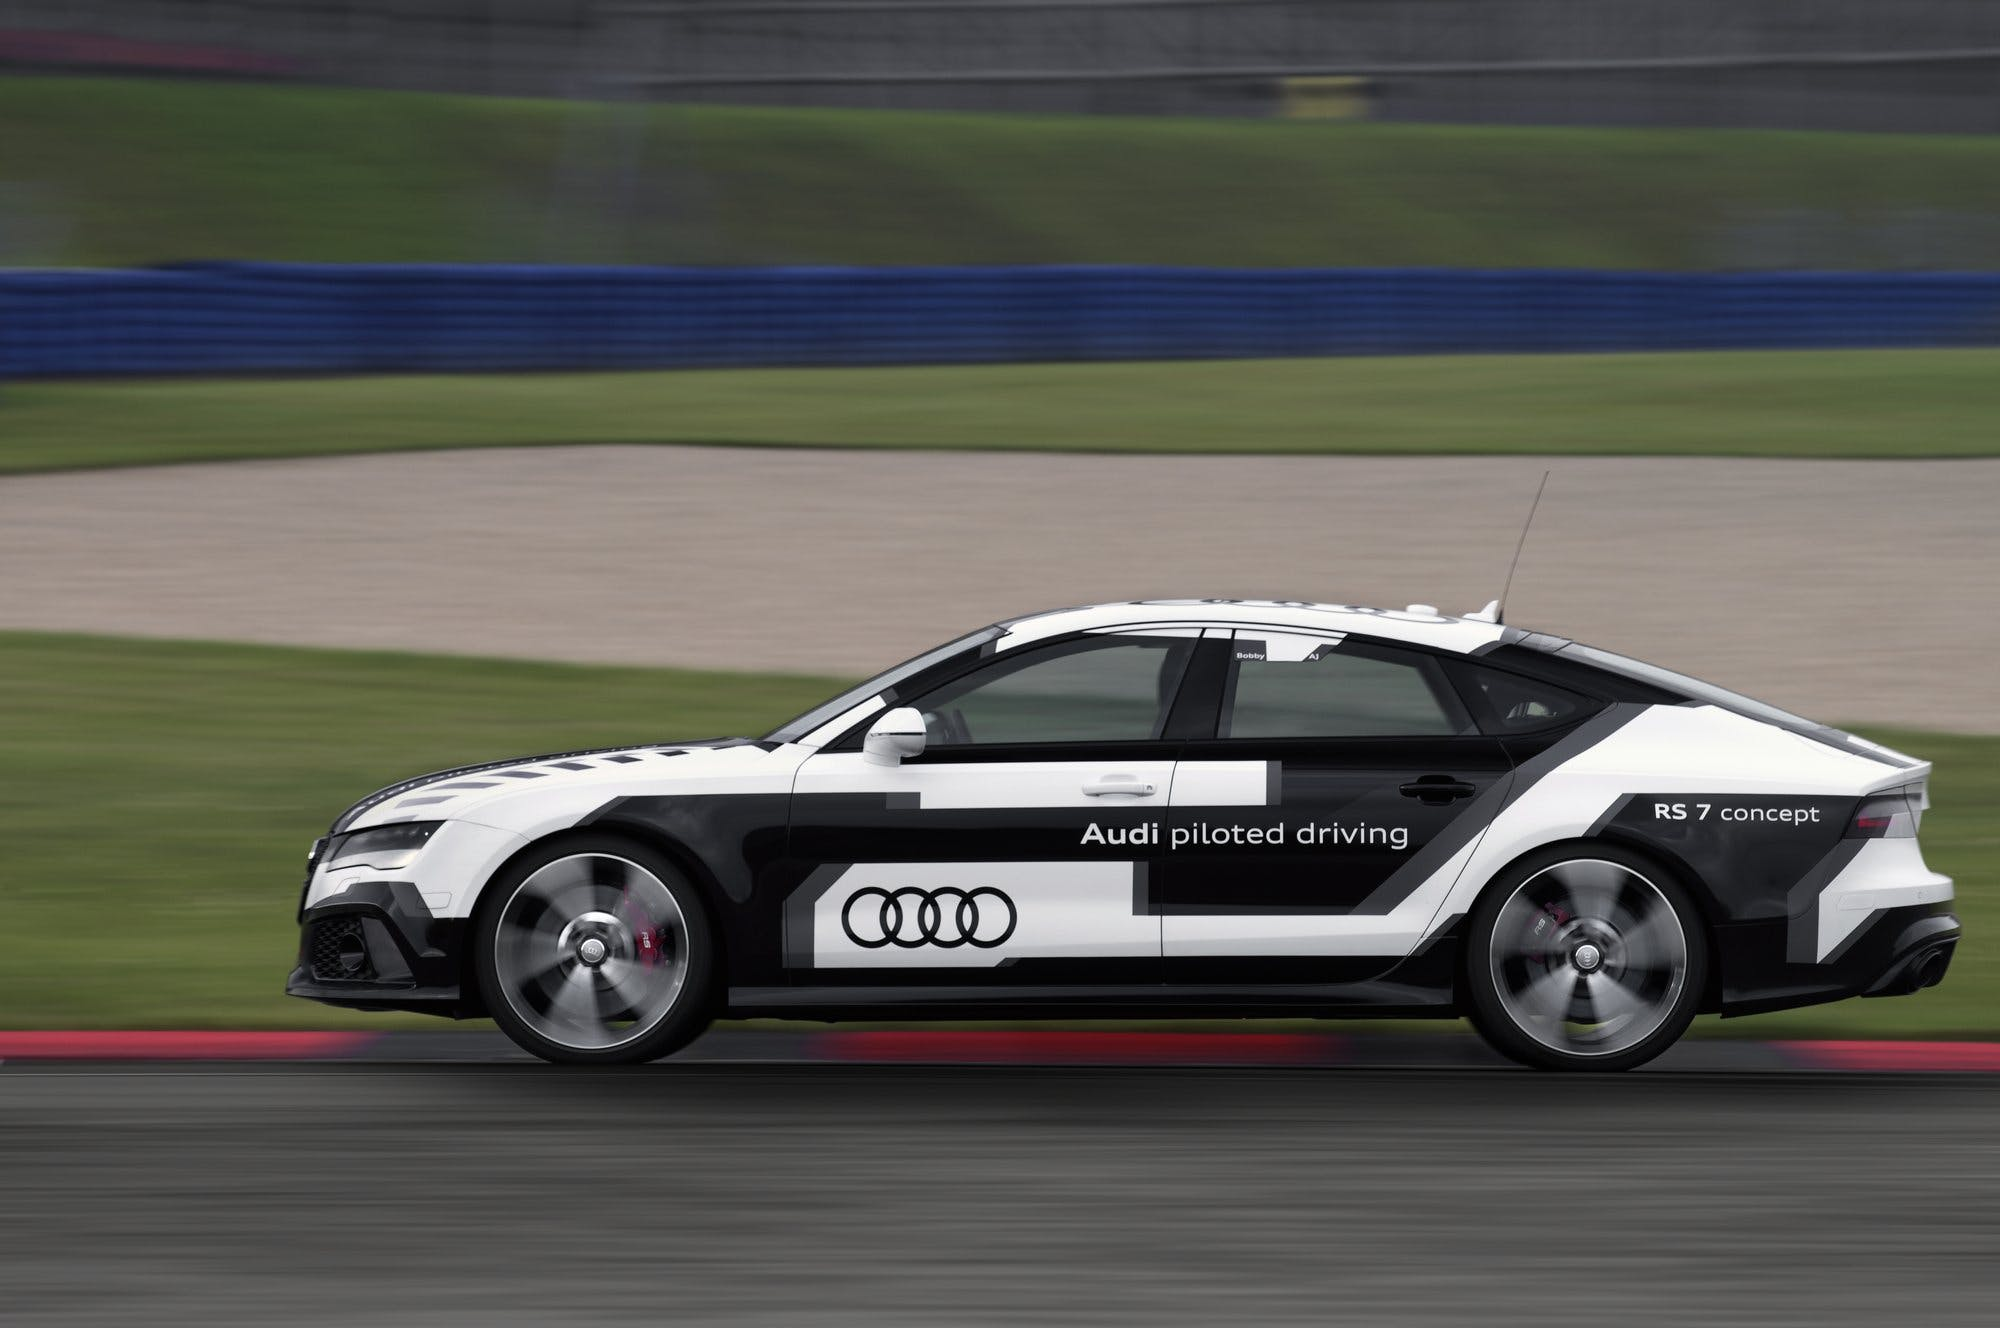 AudiRS7SportbackGuidaAutonoma-001